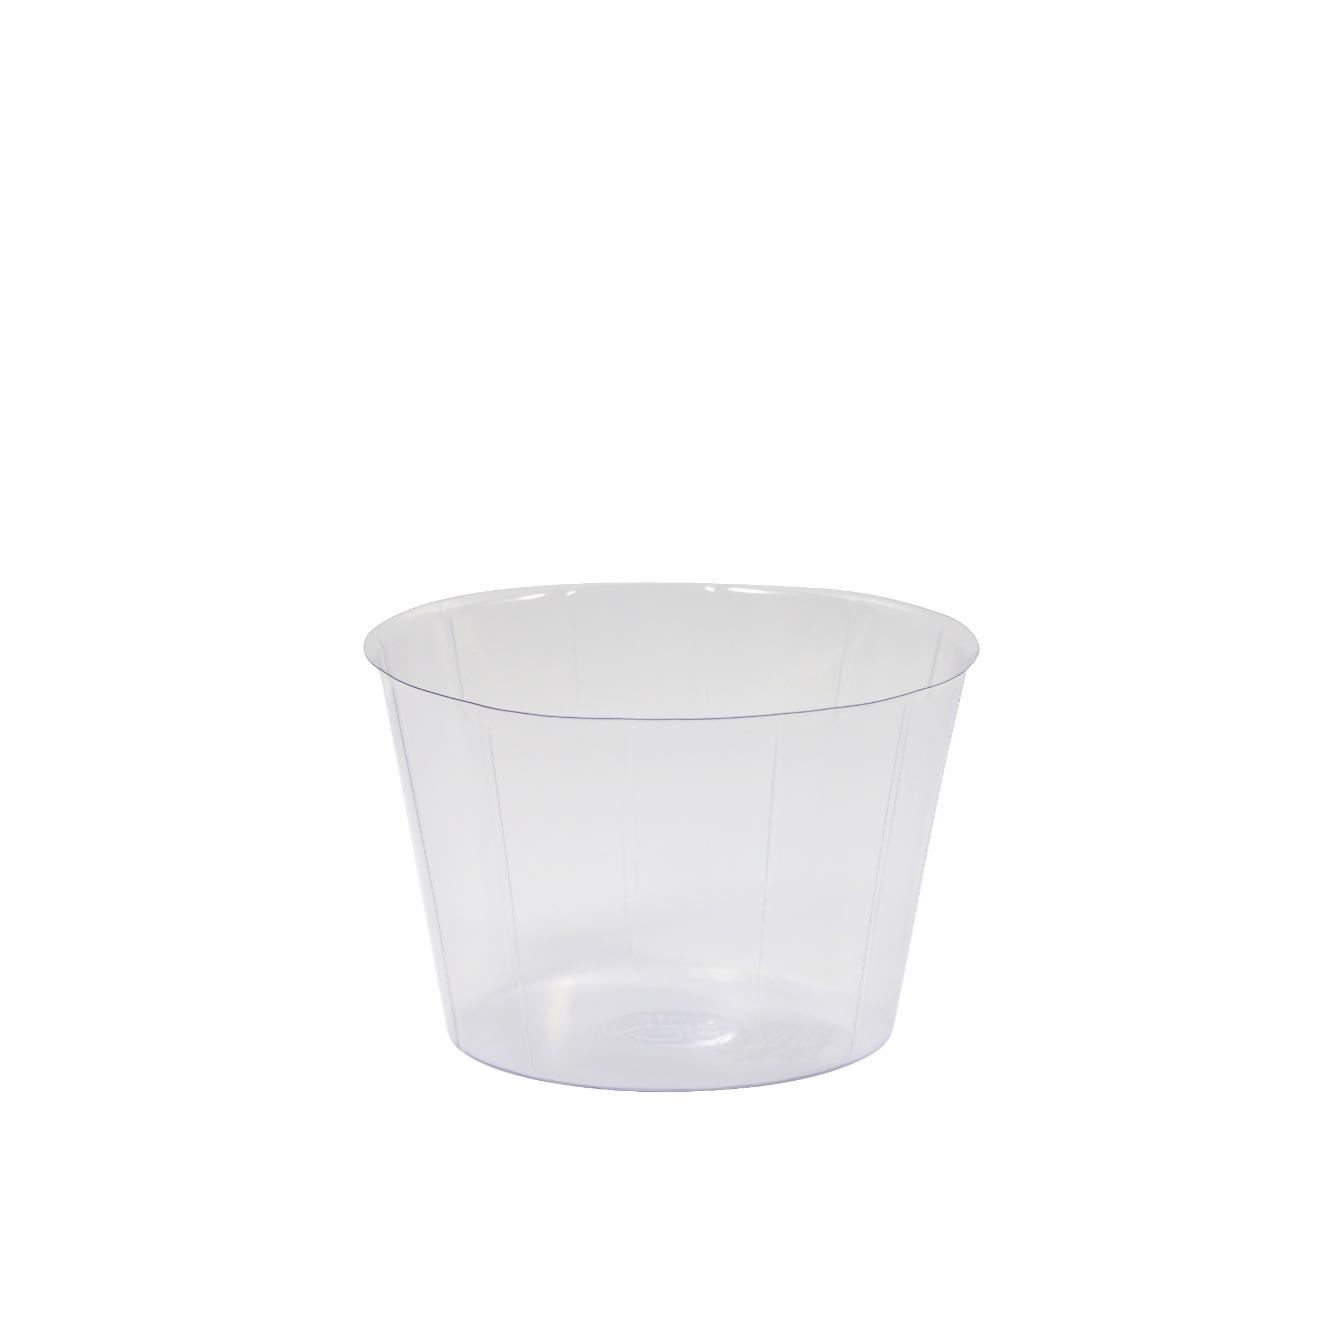 Cachepot de Plástico Transparente Inlay 20x13cm